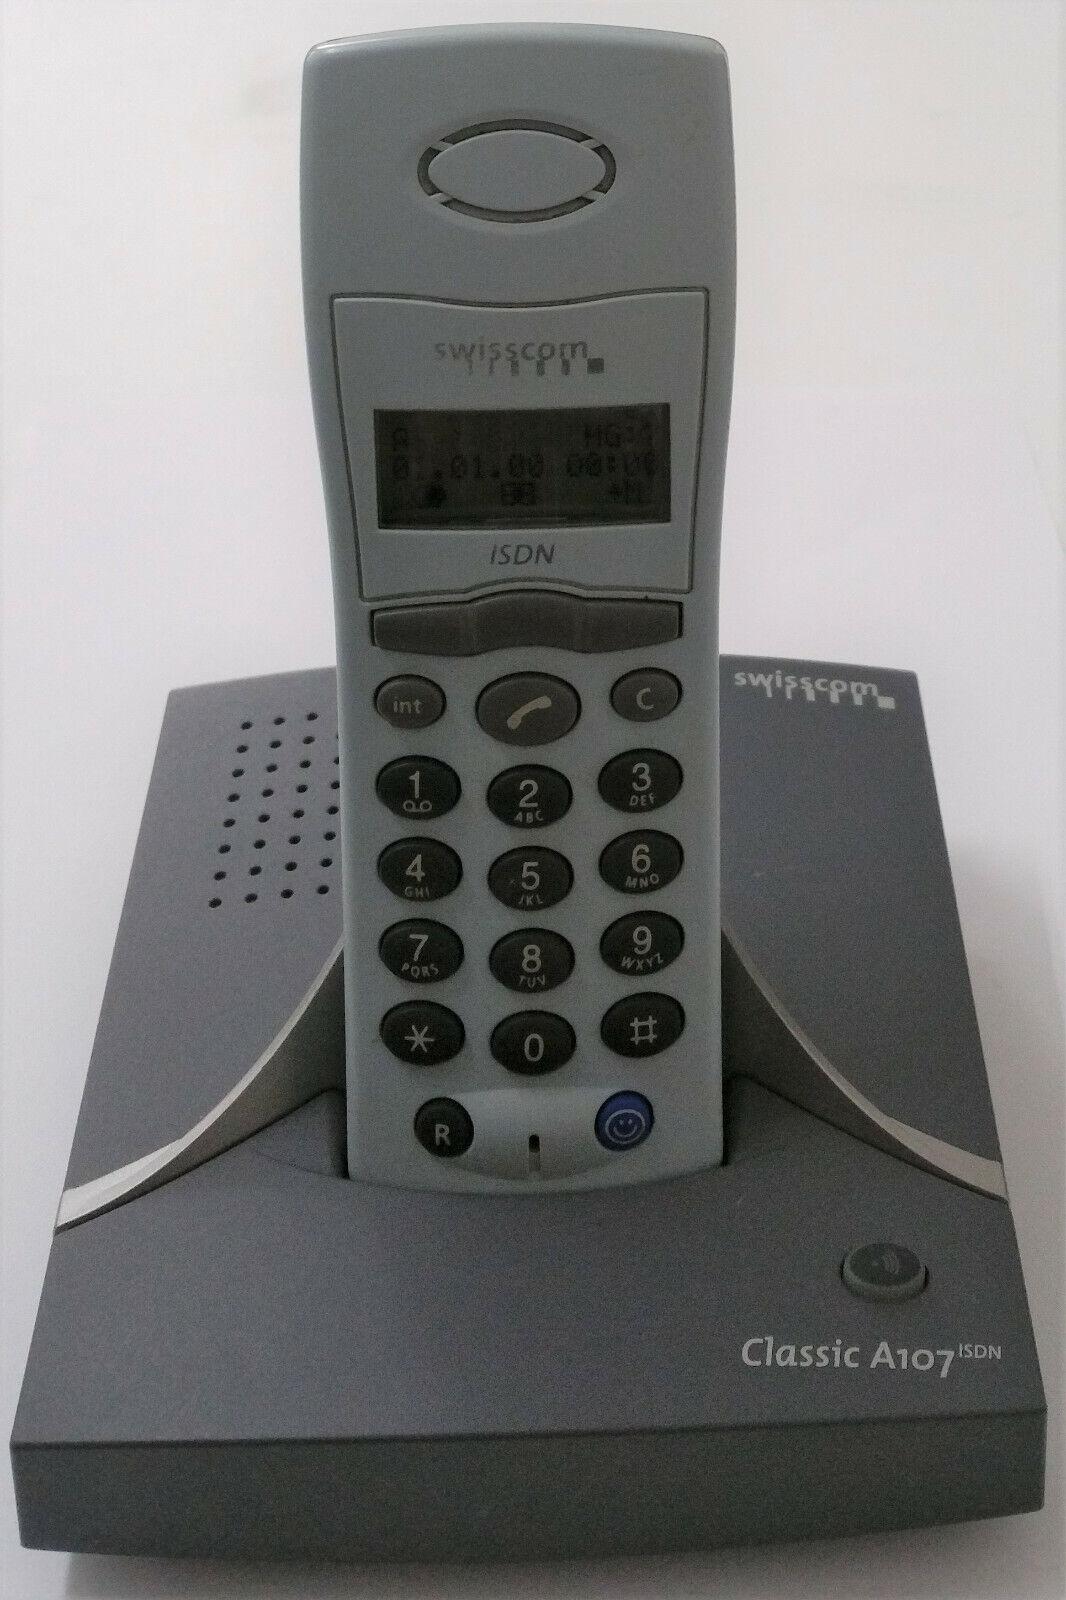 Funktelefon Swisscom Classic A107 ISDN